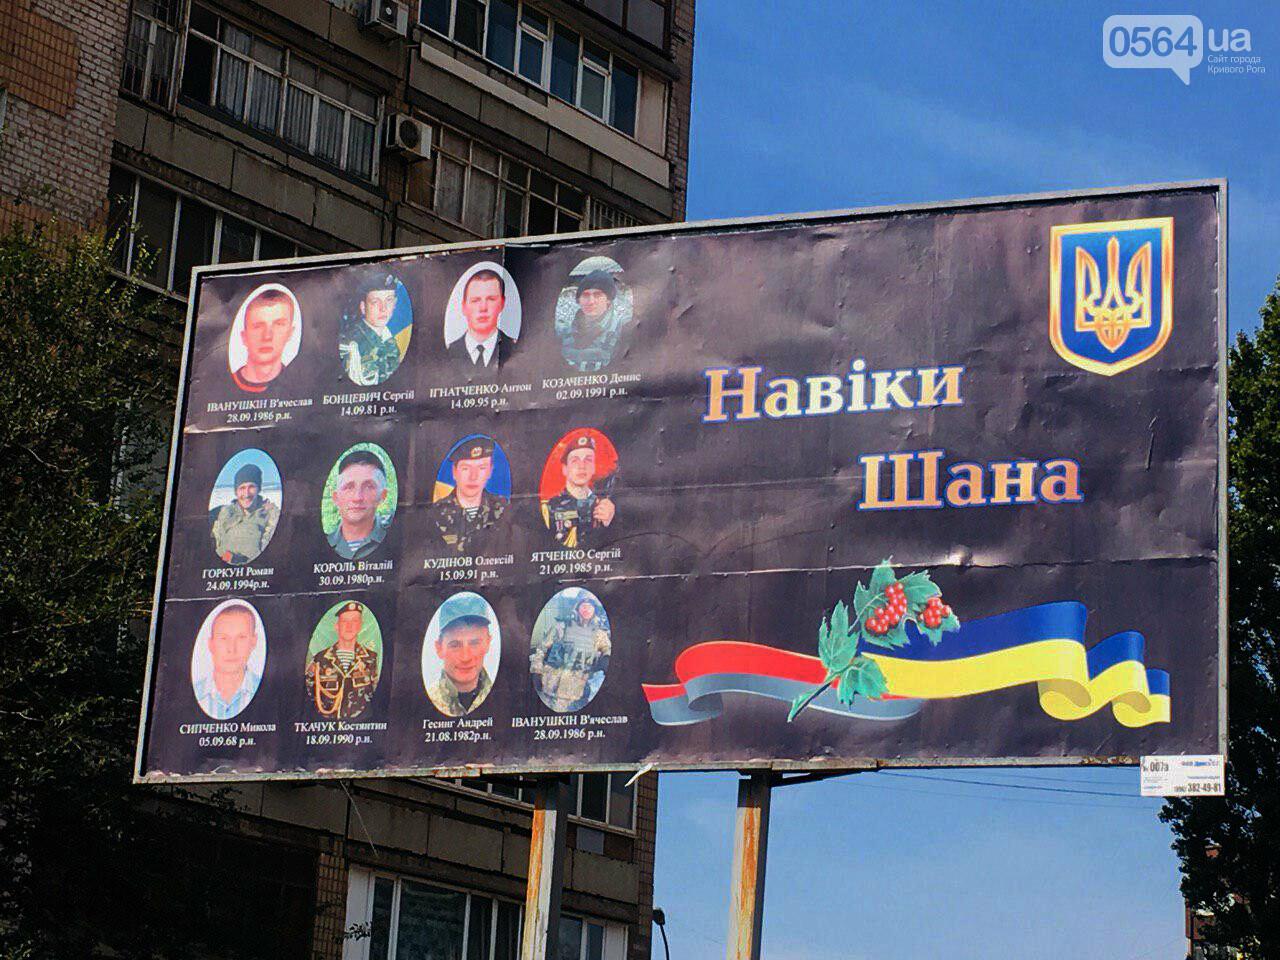 """Навіки шана"": в центре Кривого Рога разместили борд с фотографиями 11 Героев, погибших в АТО, - ФОТО , фото-9"